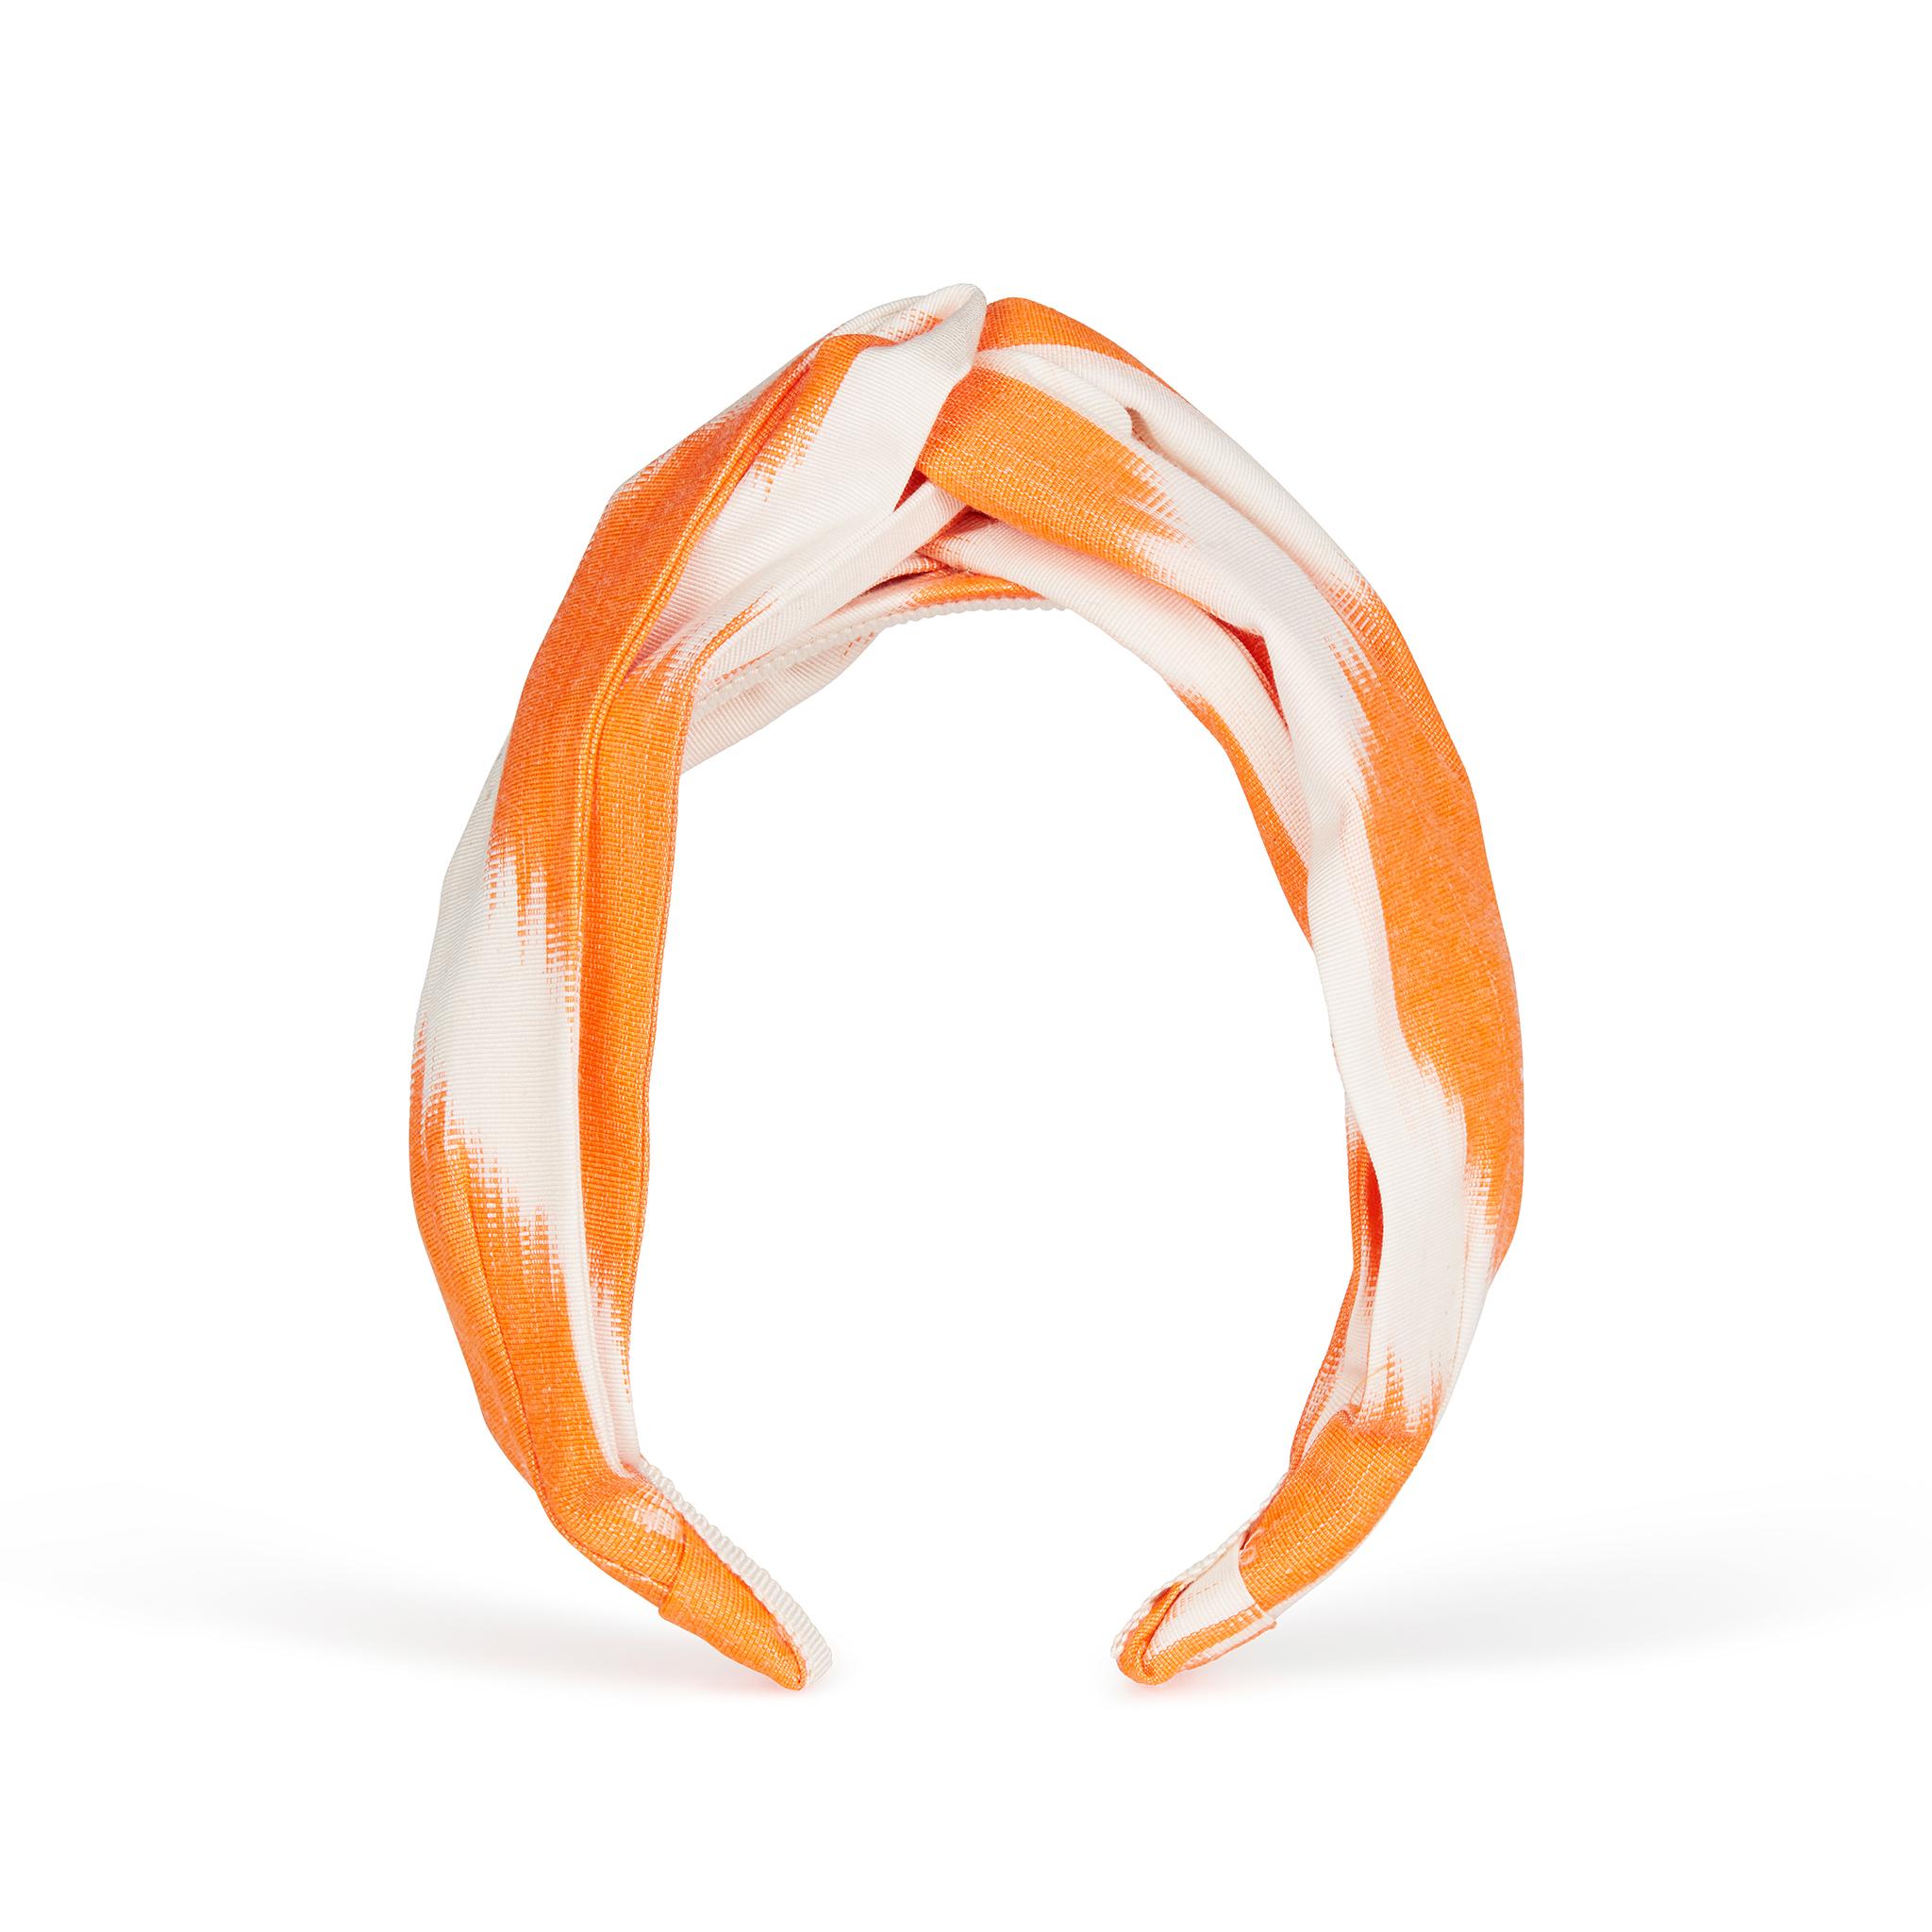 Benoit-headbands-_06.jpg